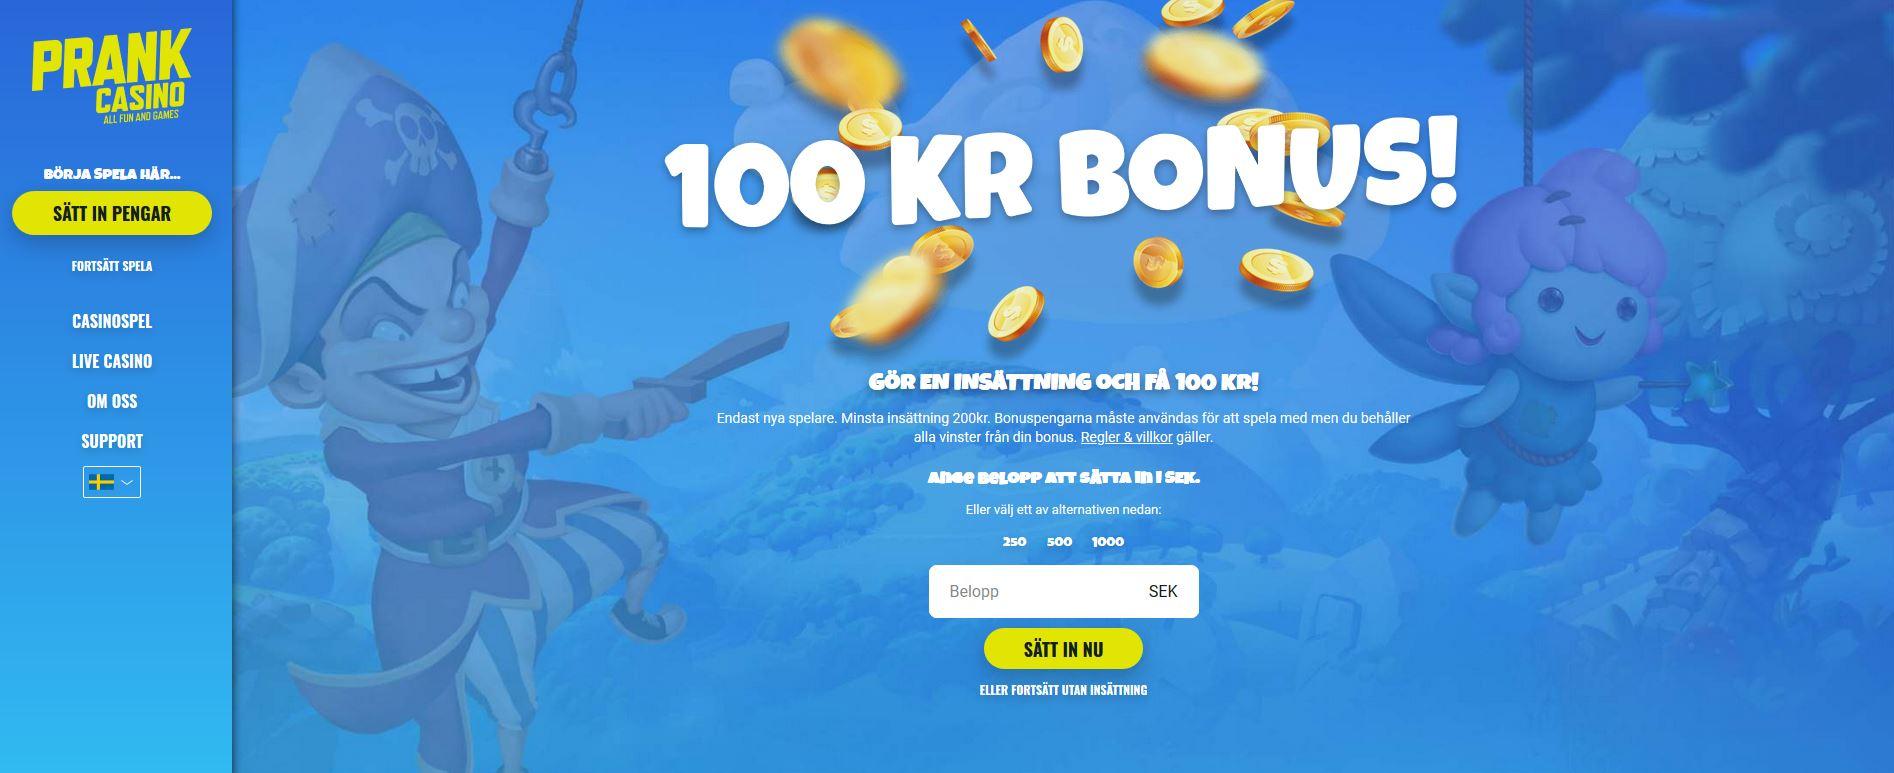 Prank Casino Recension 2021